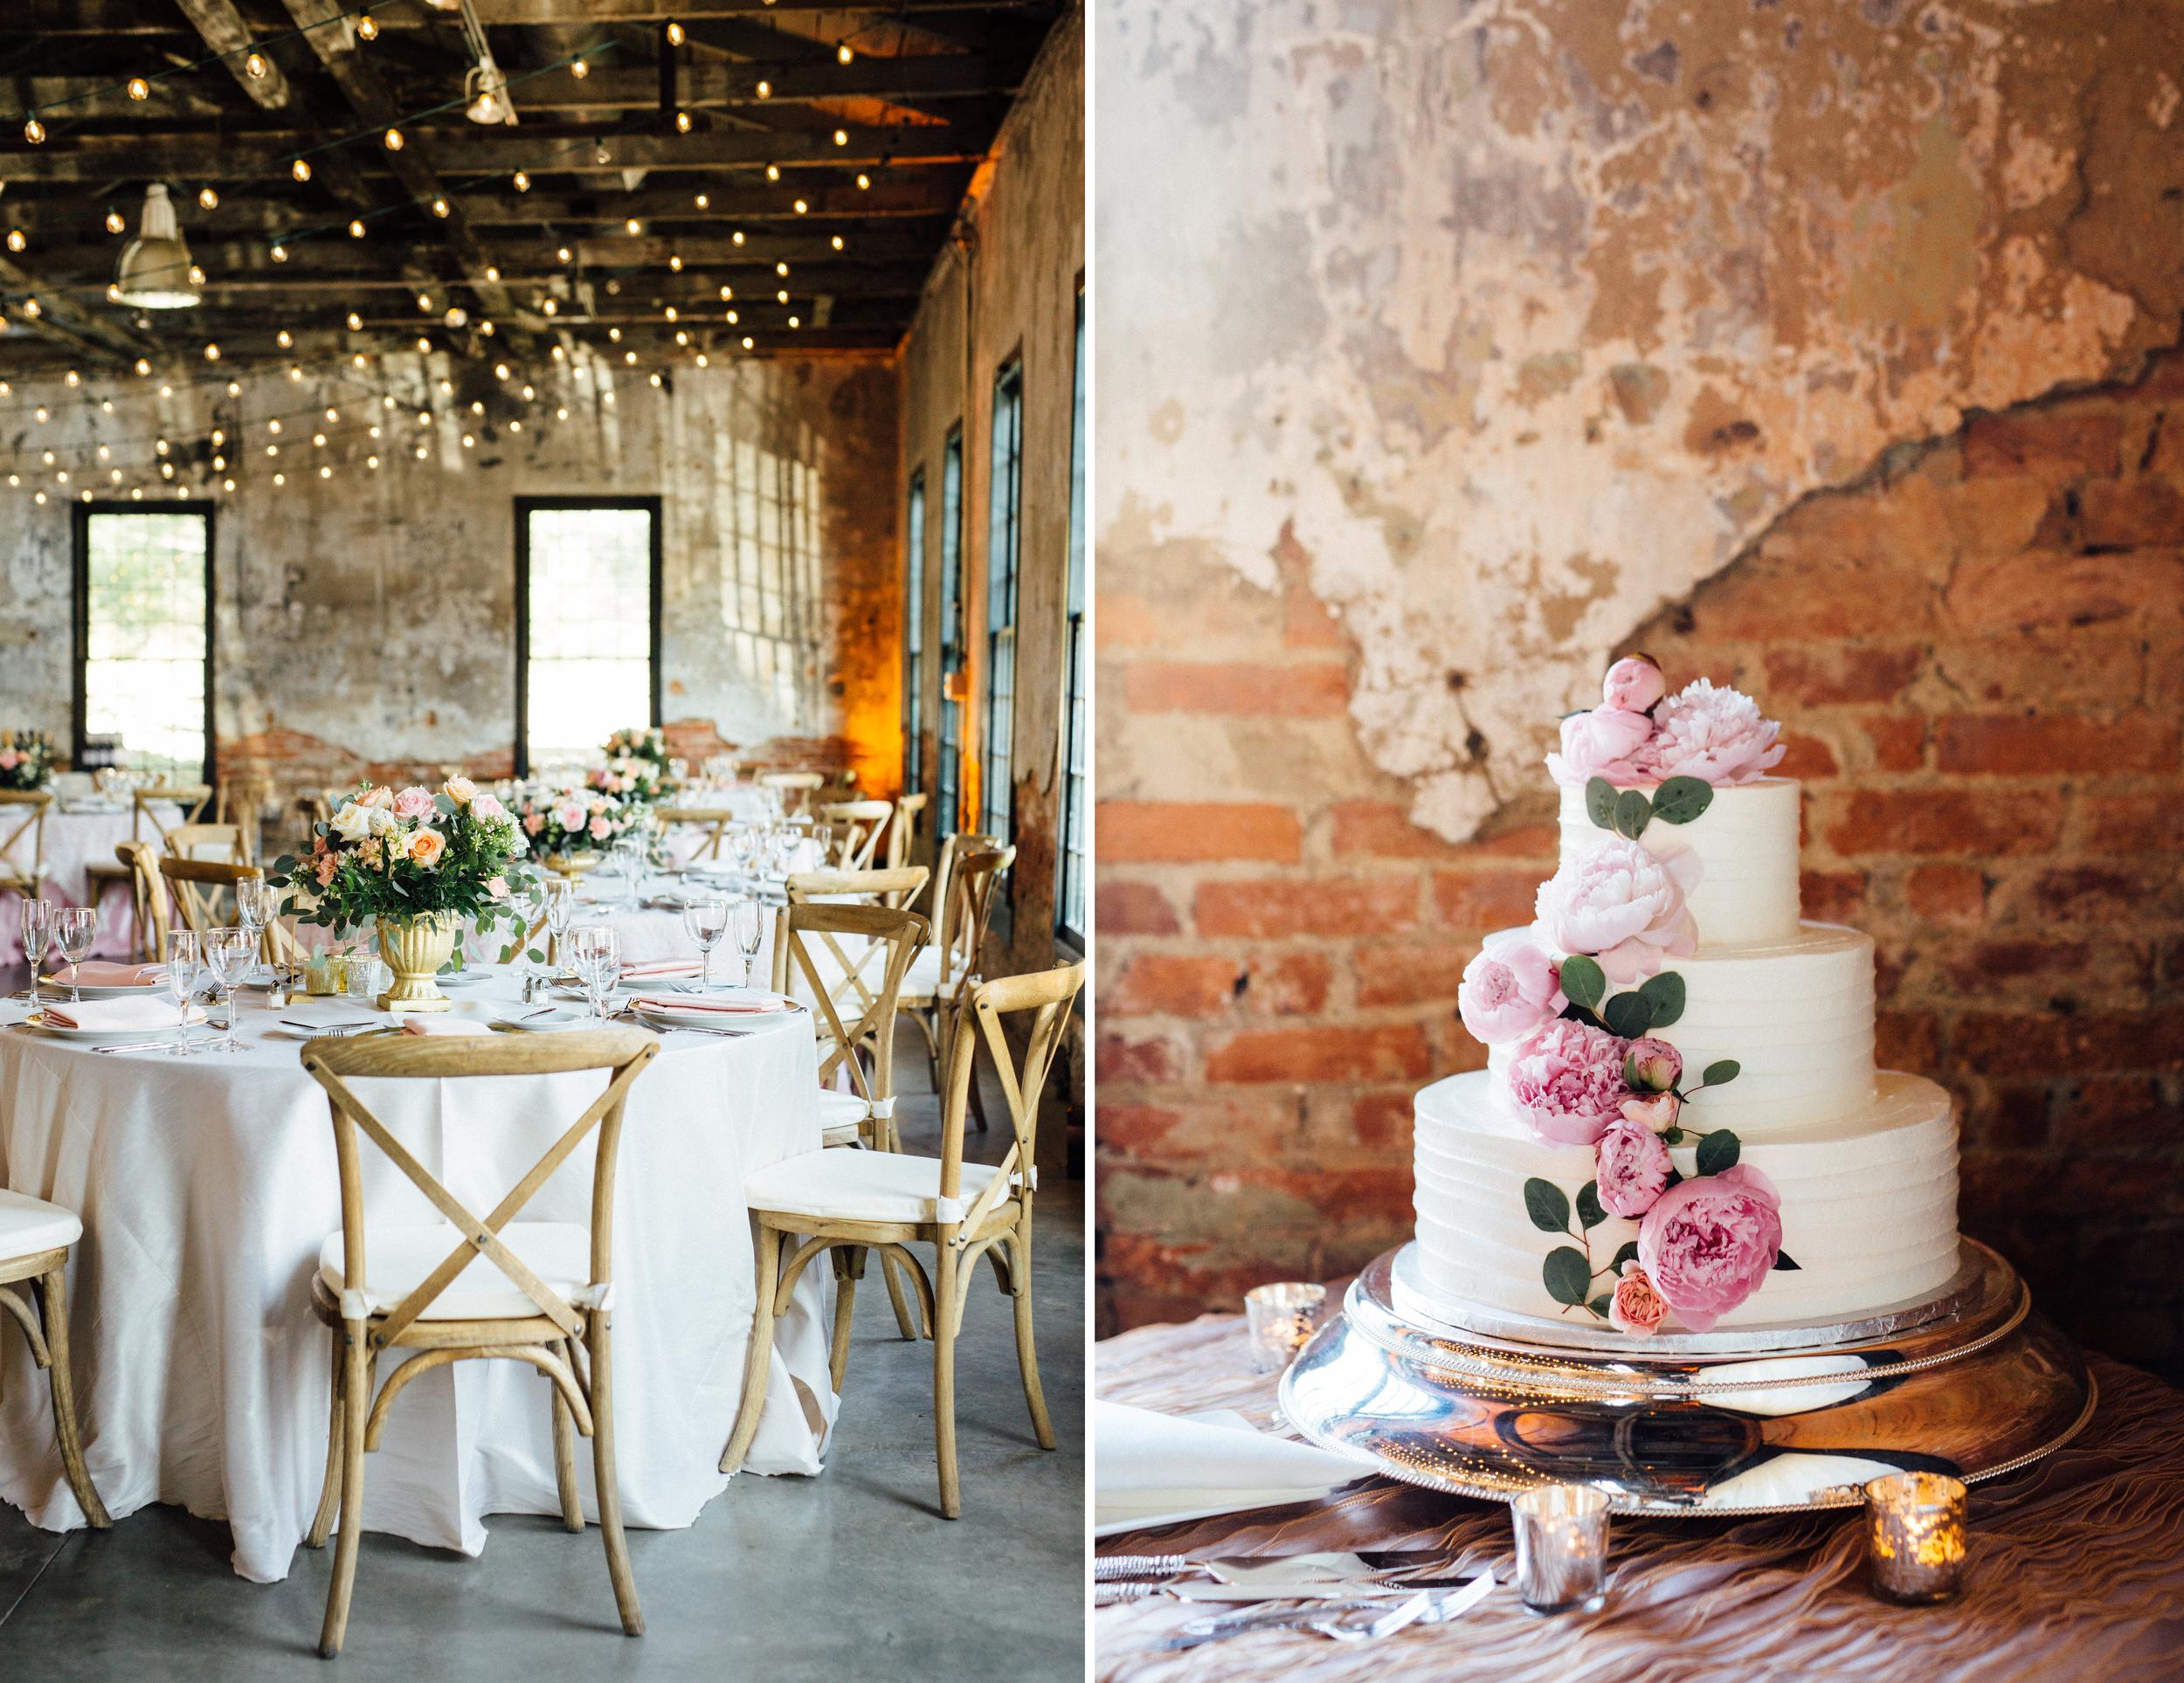 mt-washington-mill-dye-house-wedding-photography_maryland_1.jpg